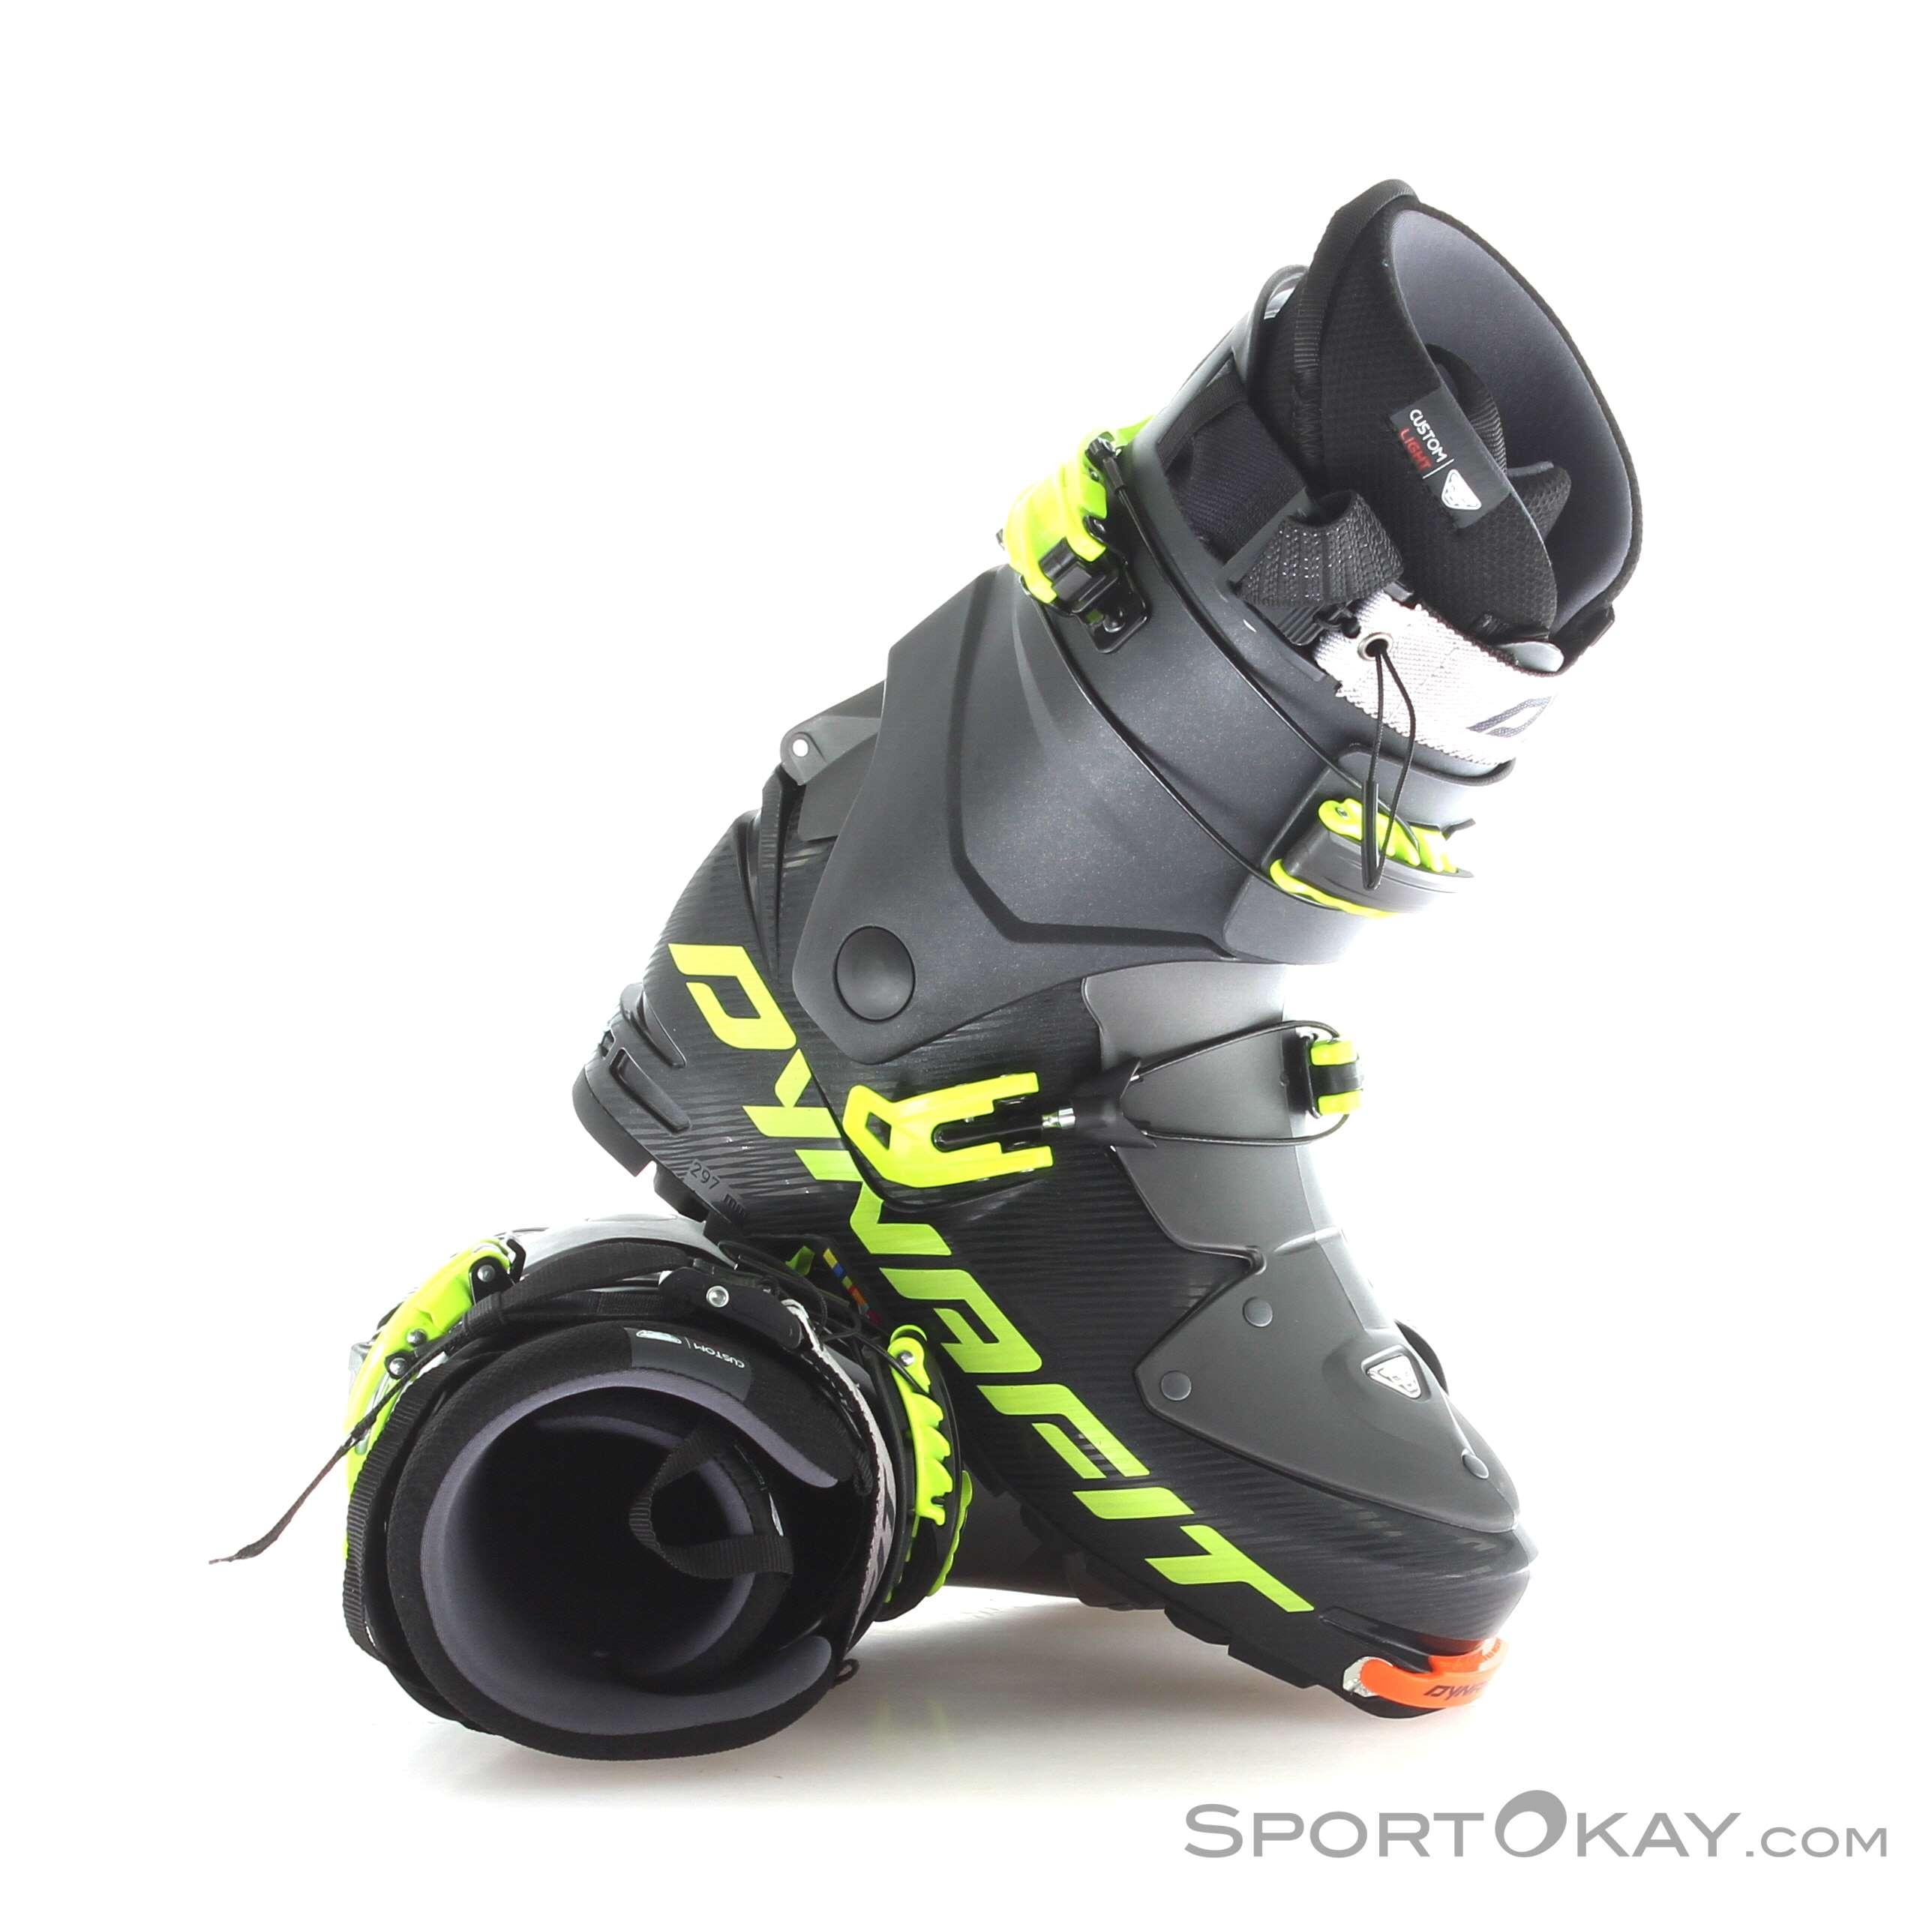 1a948be7443 Dynafit TLT Speedfit Ski Touring Boots , Dynafit, Black, , Male, 0015-